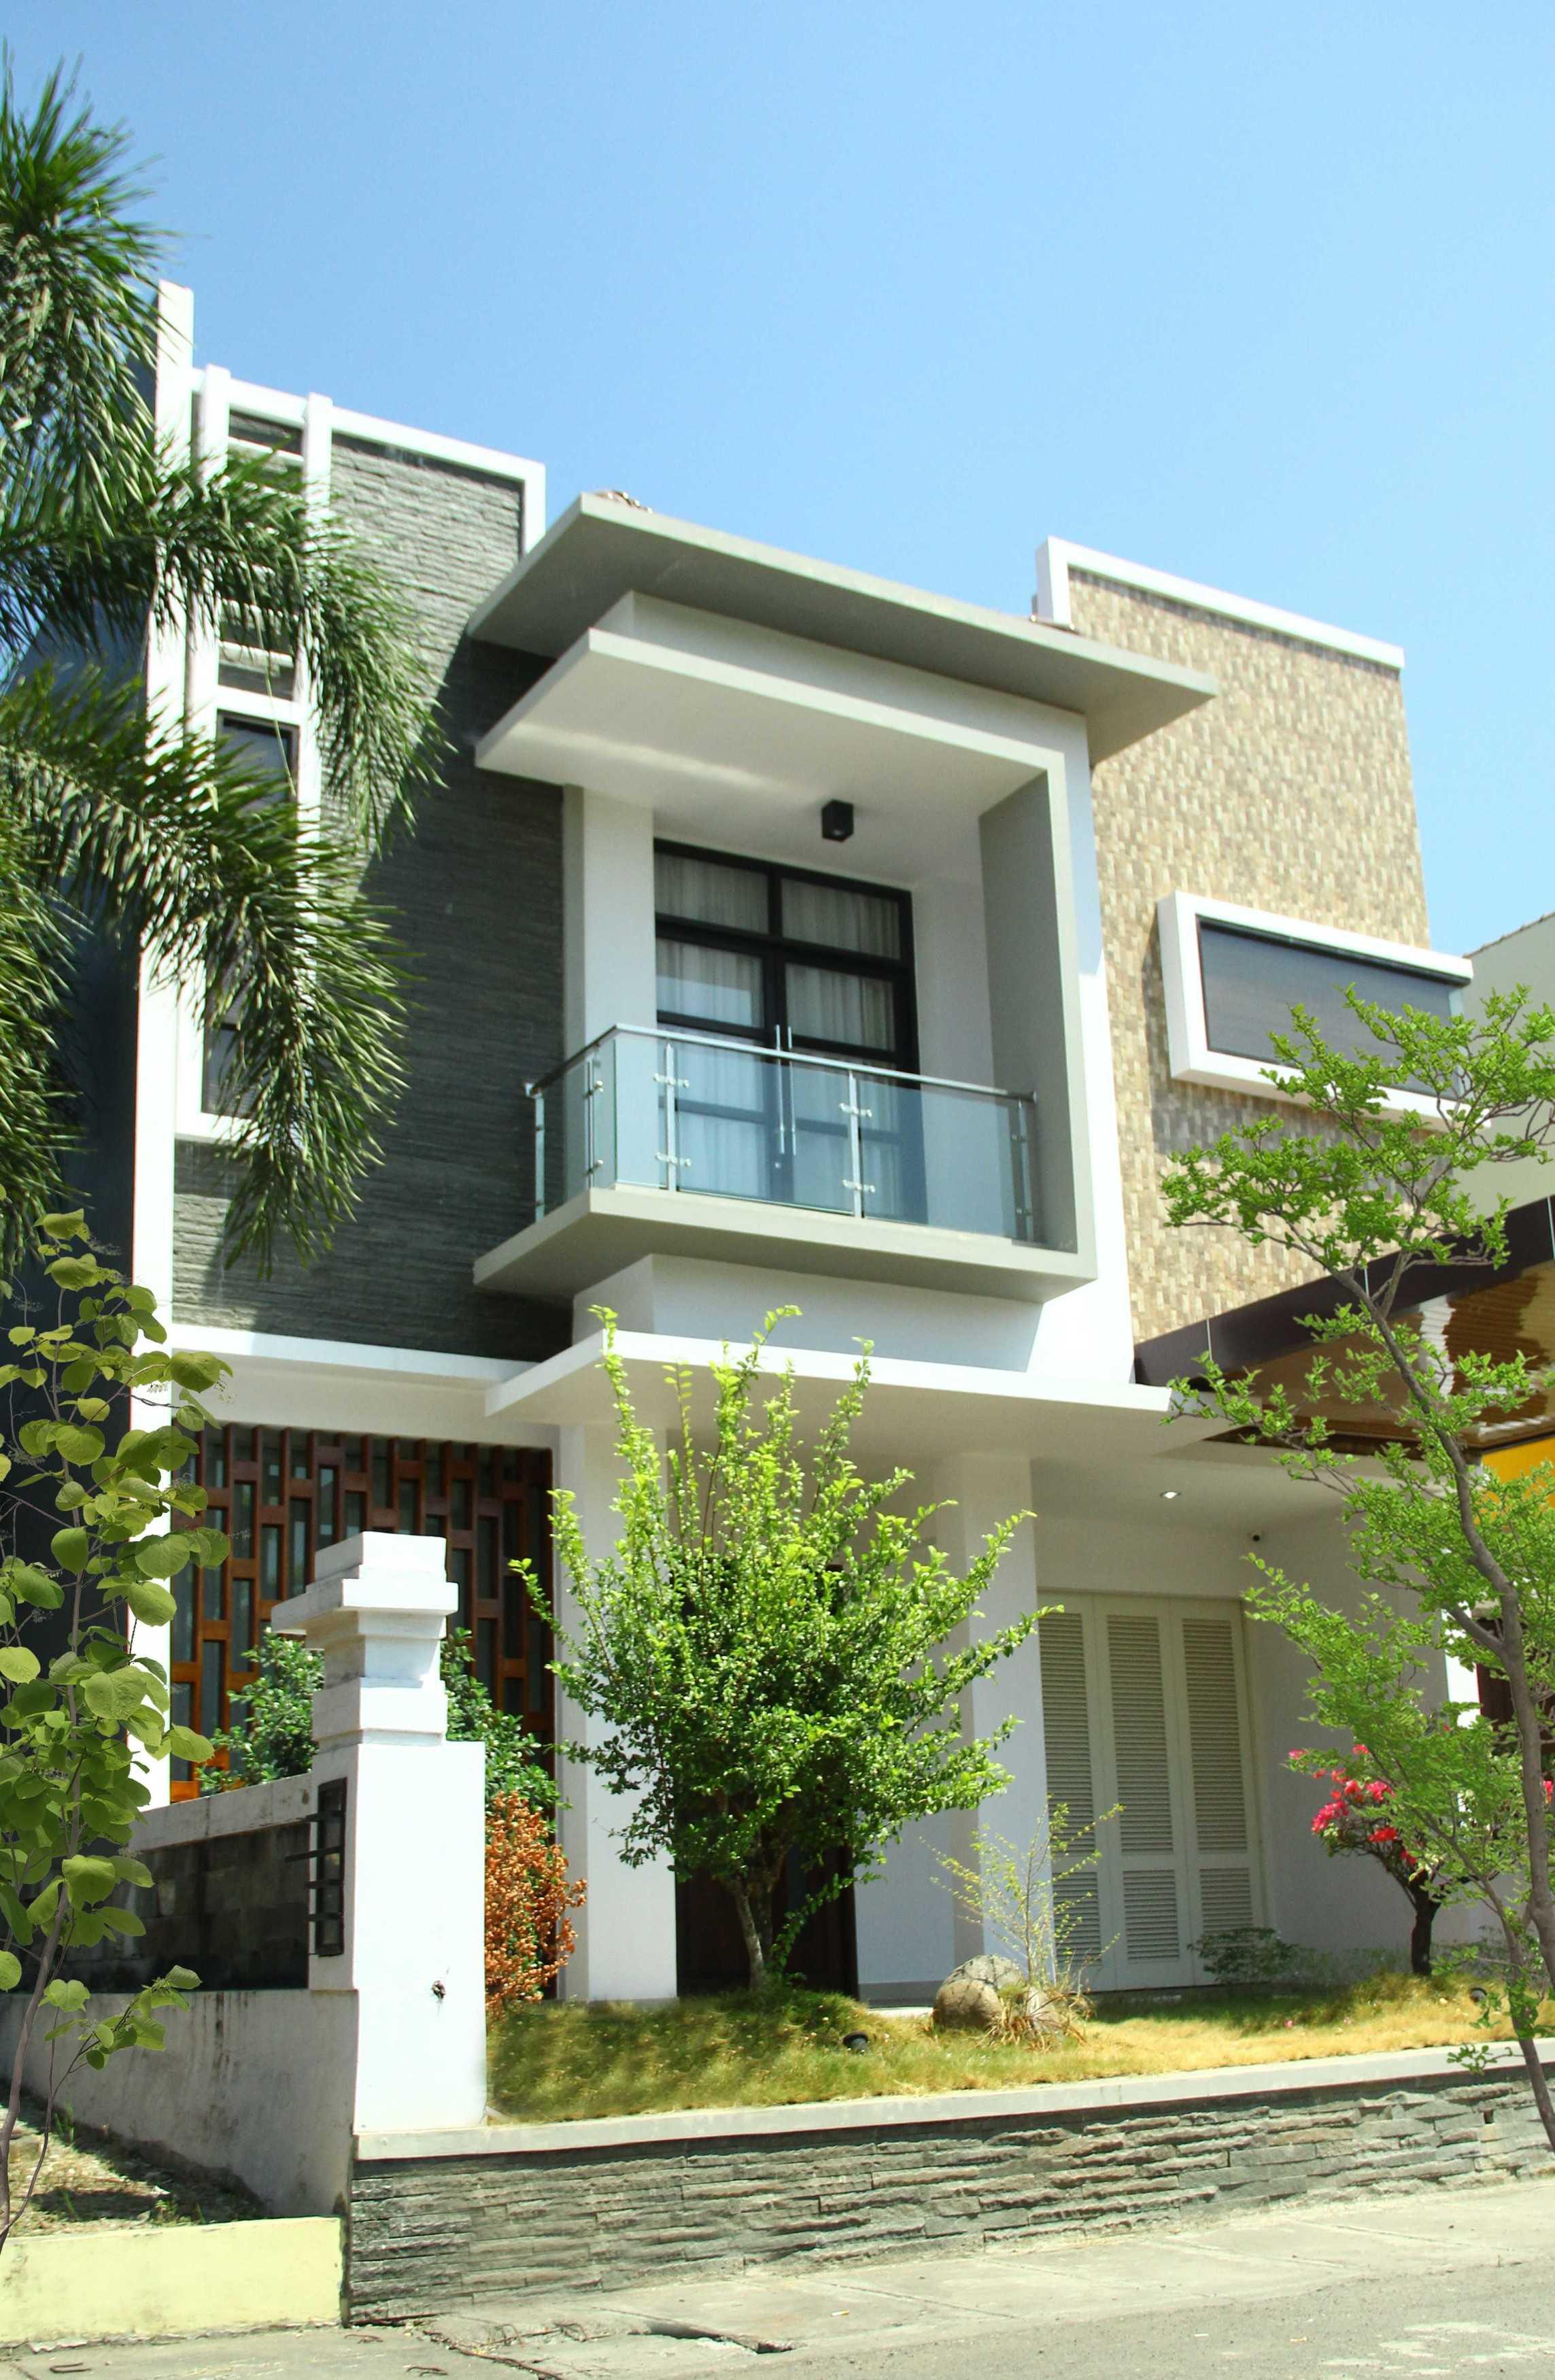 Miv Architects (Ar. Muhammad Ikhsan Hamiru, Iai & Partners) Desain Rehabilitasi Rumah Phinisi Makassar | With Pt.dap Makassar Makassar Img1342 Modern  30407